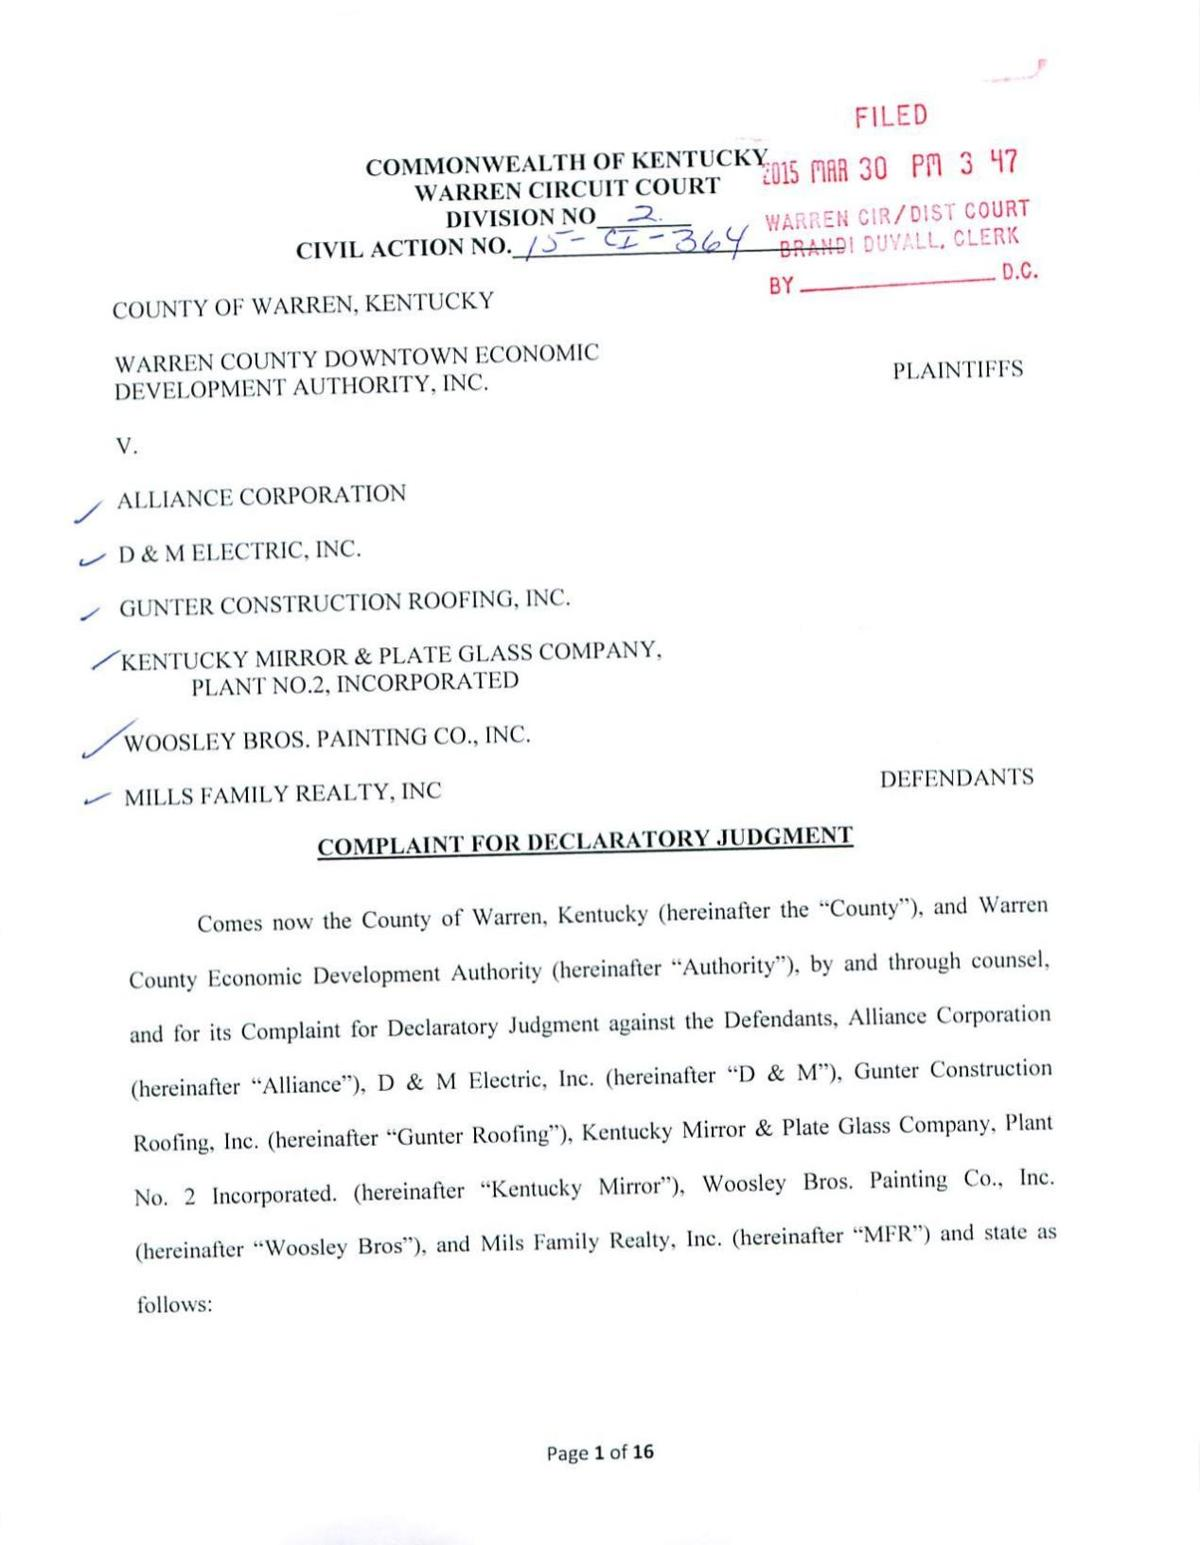 Complaint for Declaratory Judgment